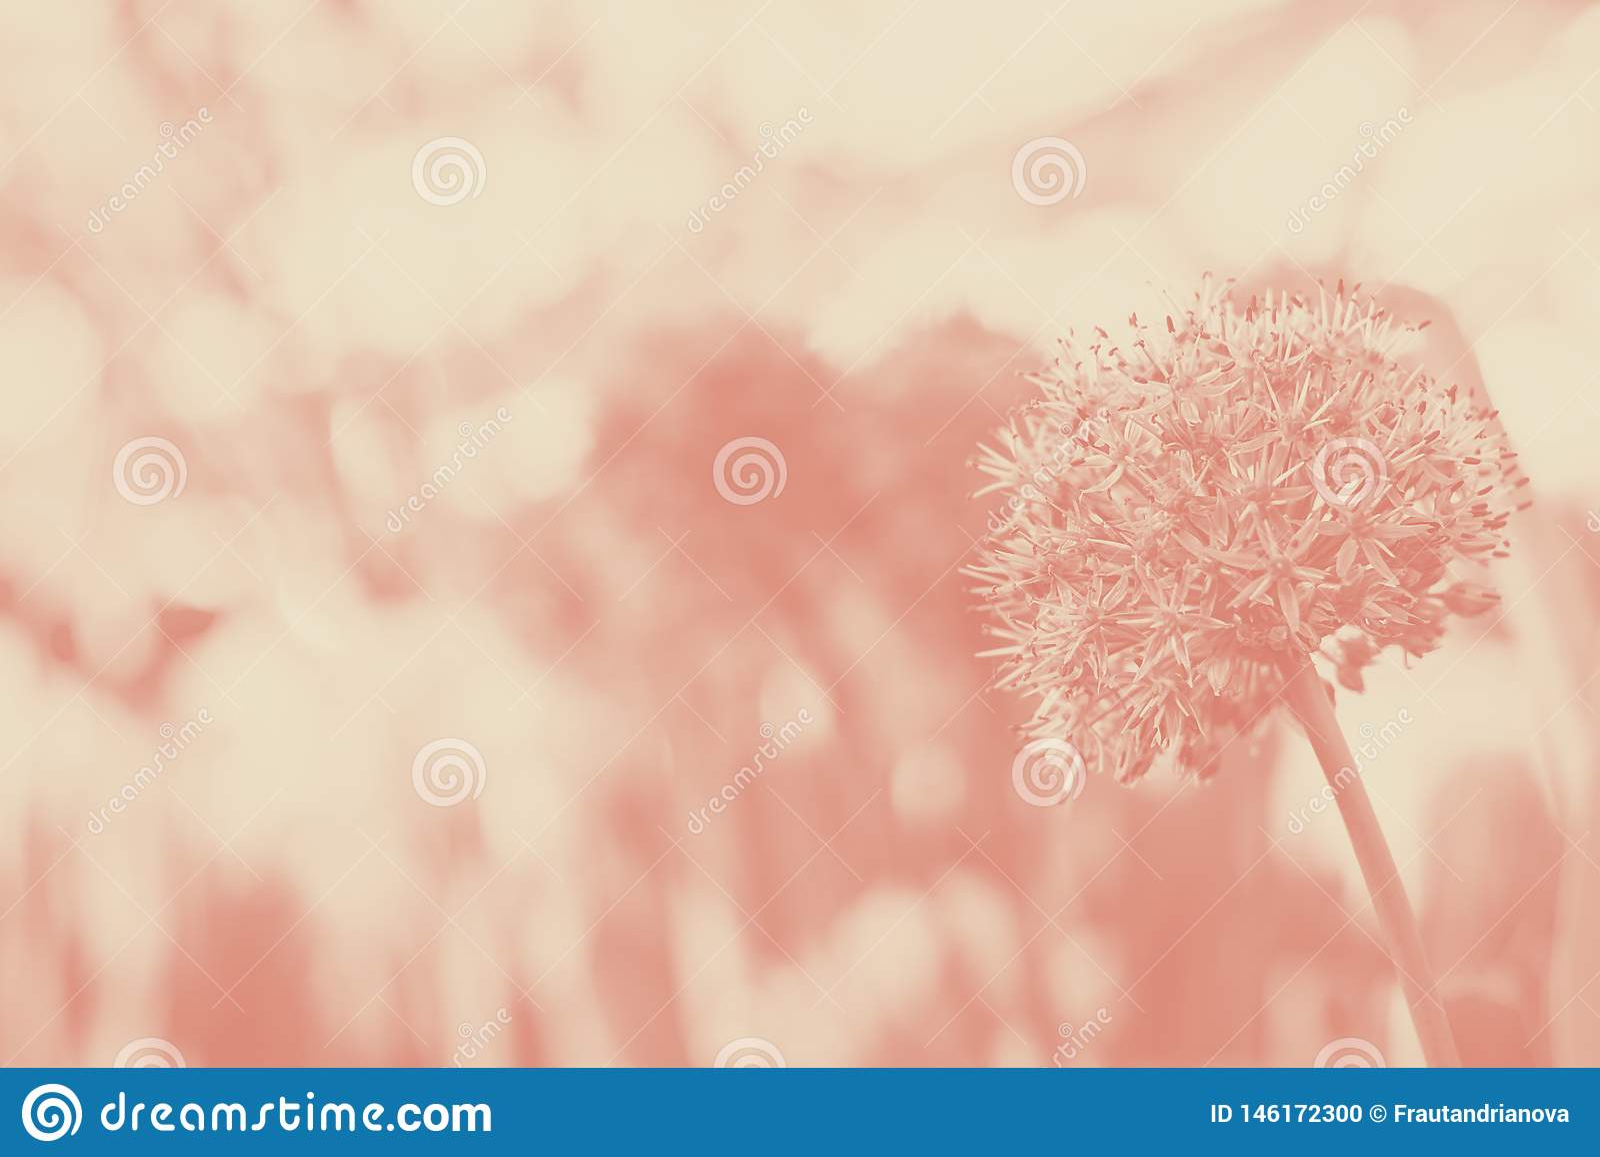 Allium gigante Giganteum que floresce, foco seletivo da cebola, coral, duotone